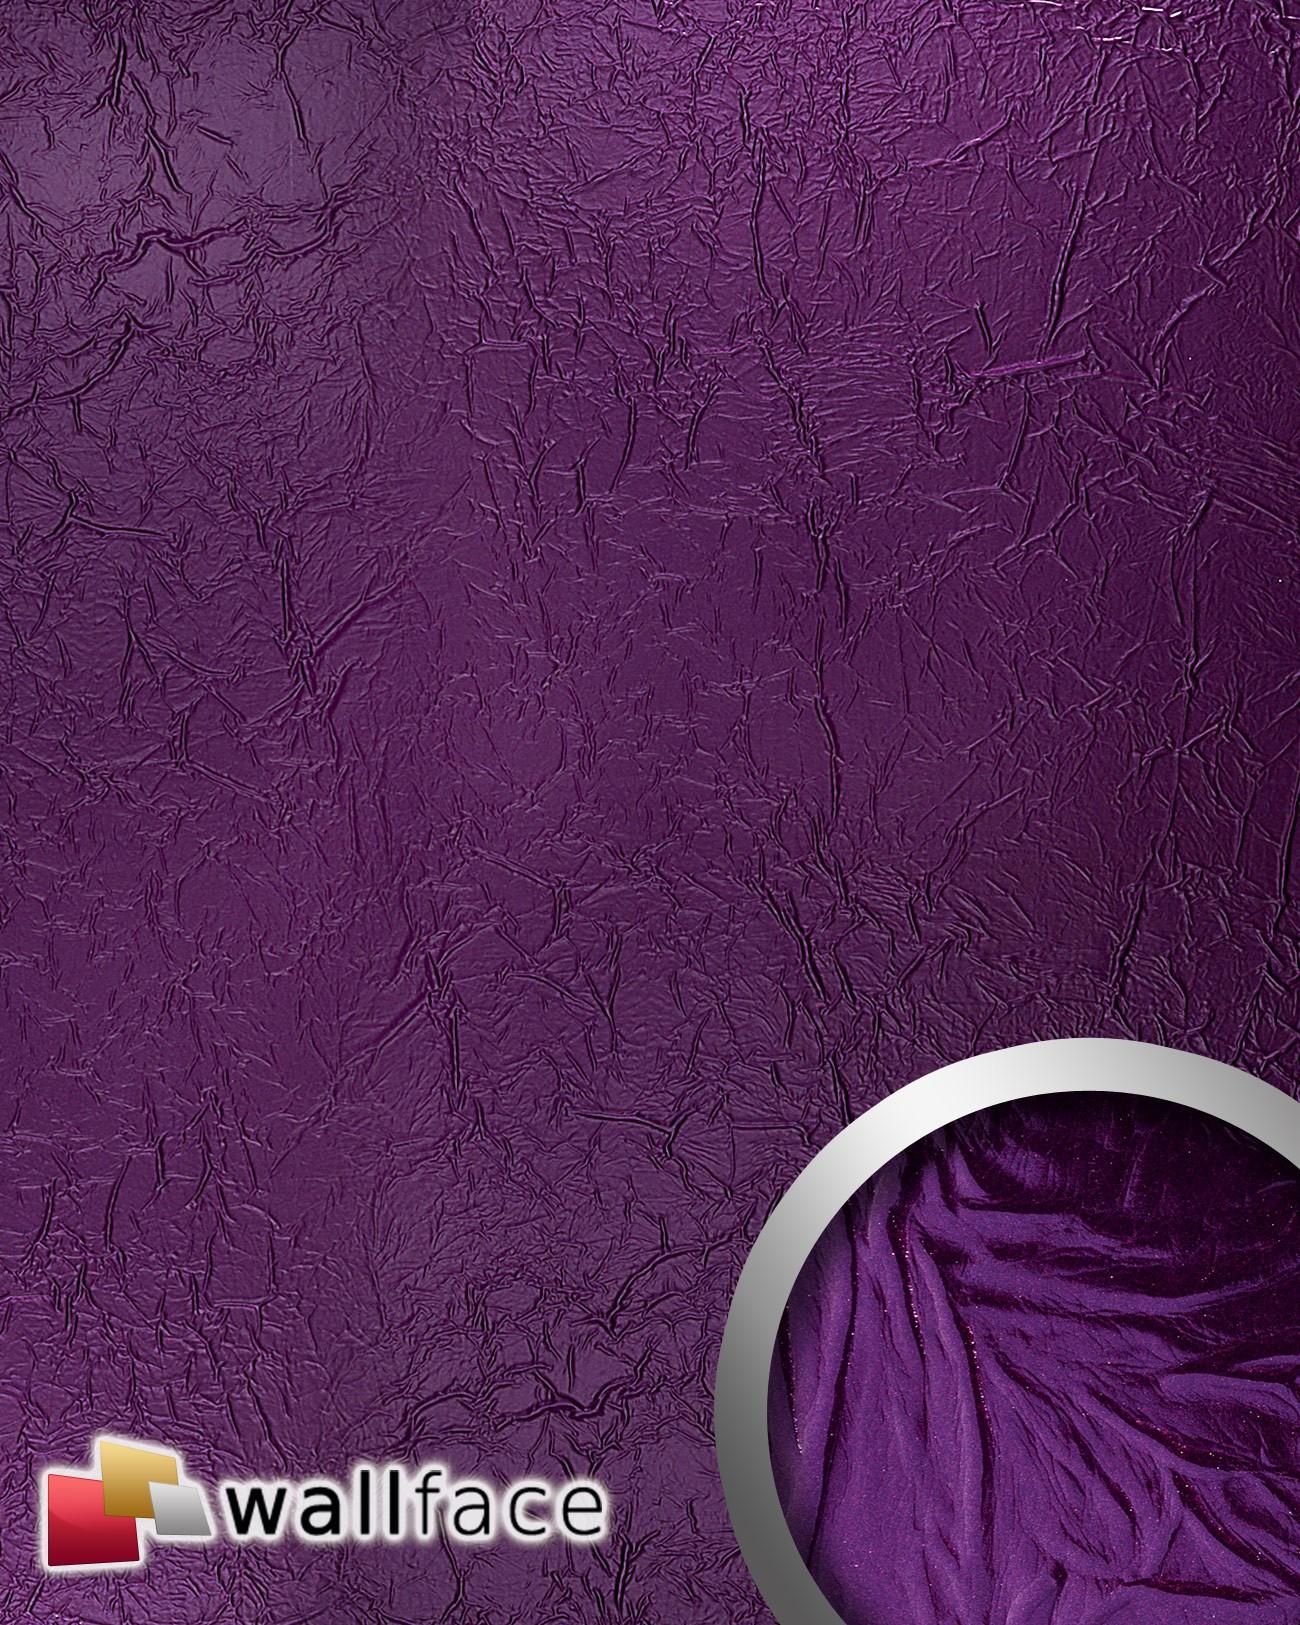 Panou Decorativ Leather 14318  Wallface  Autocolan